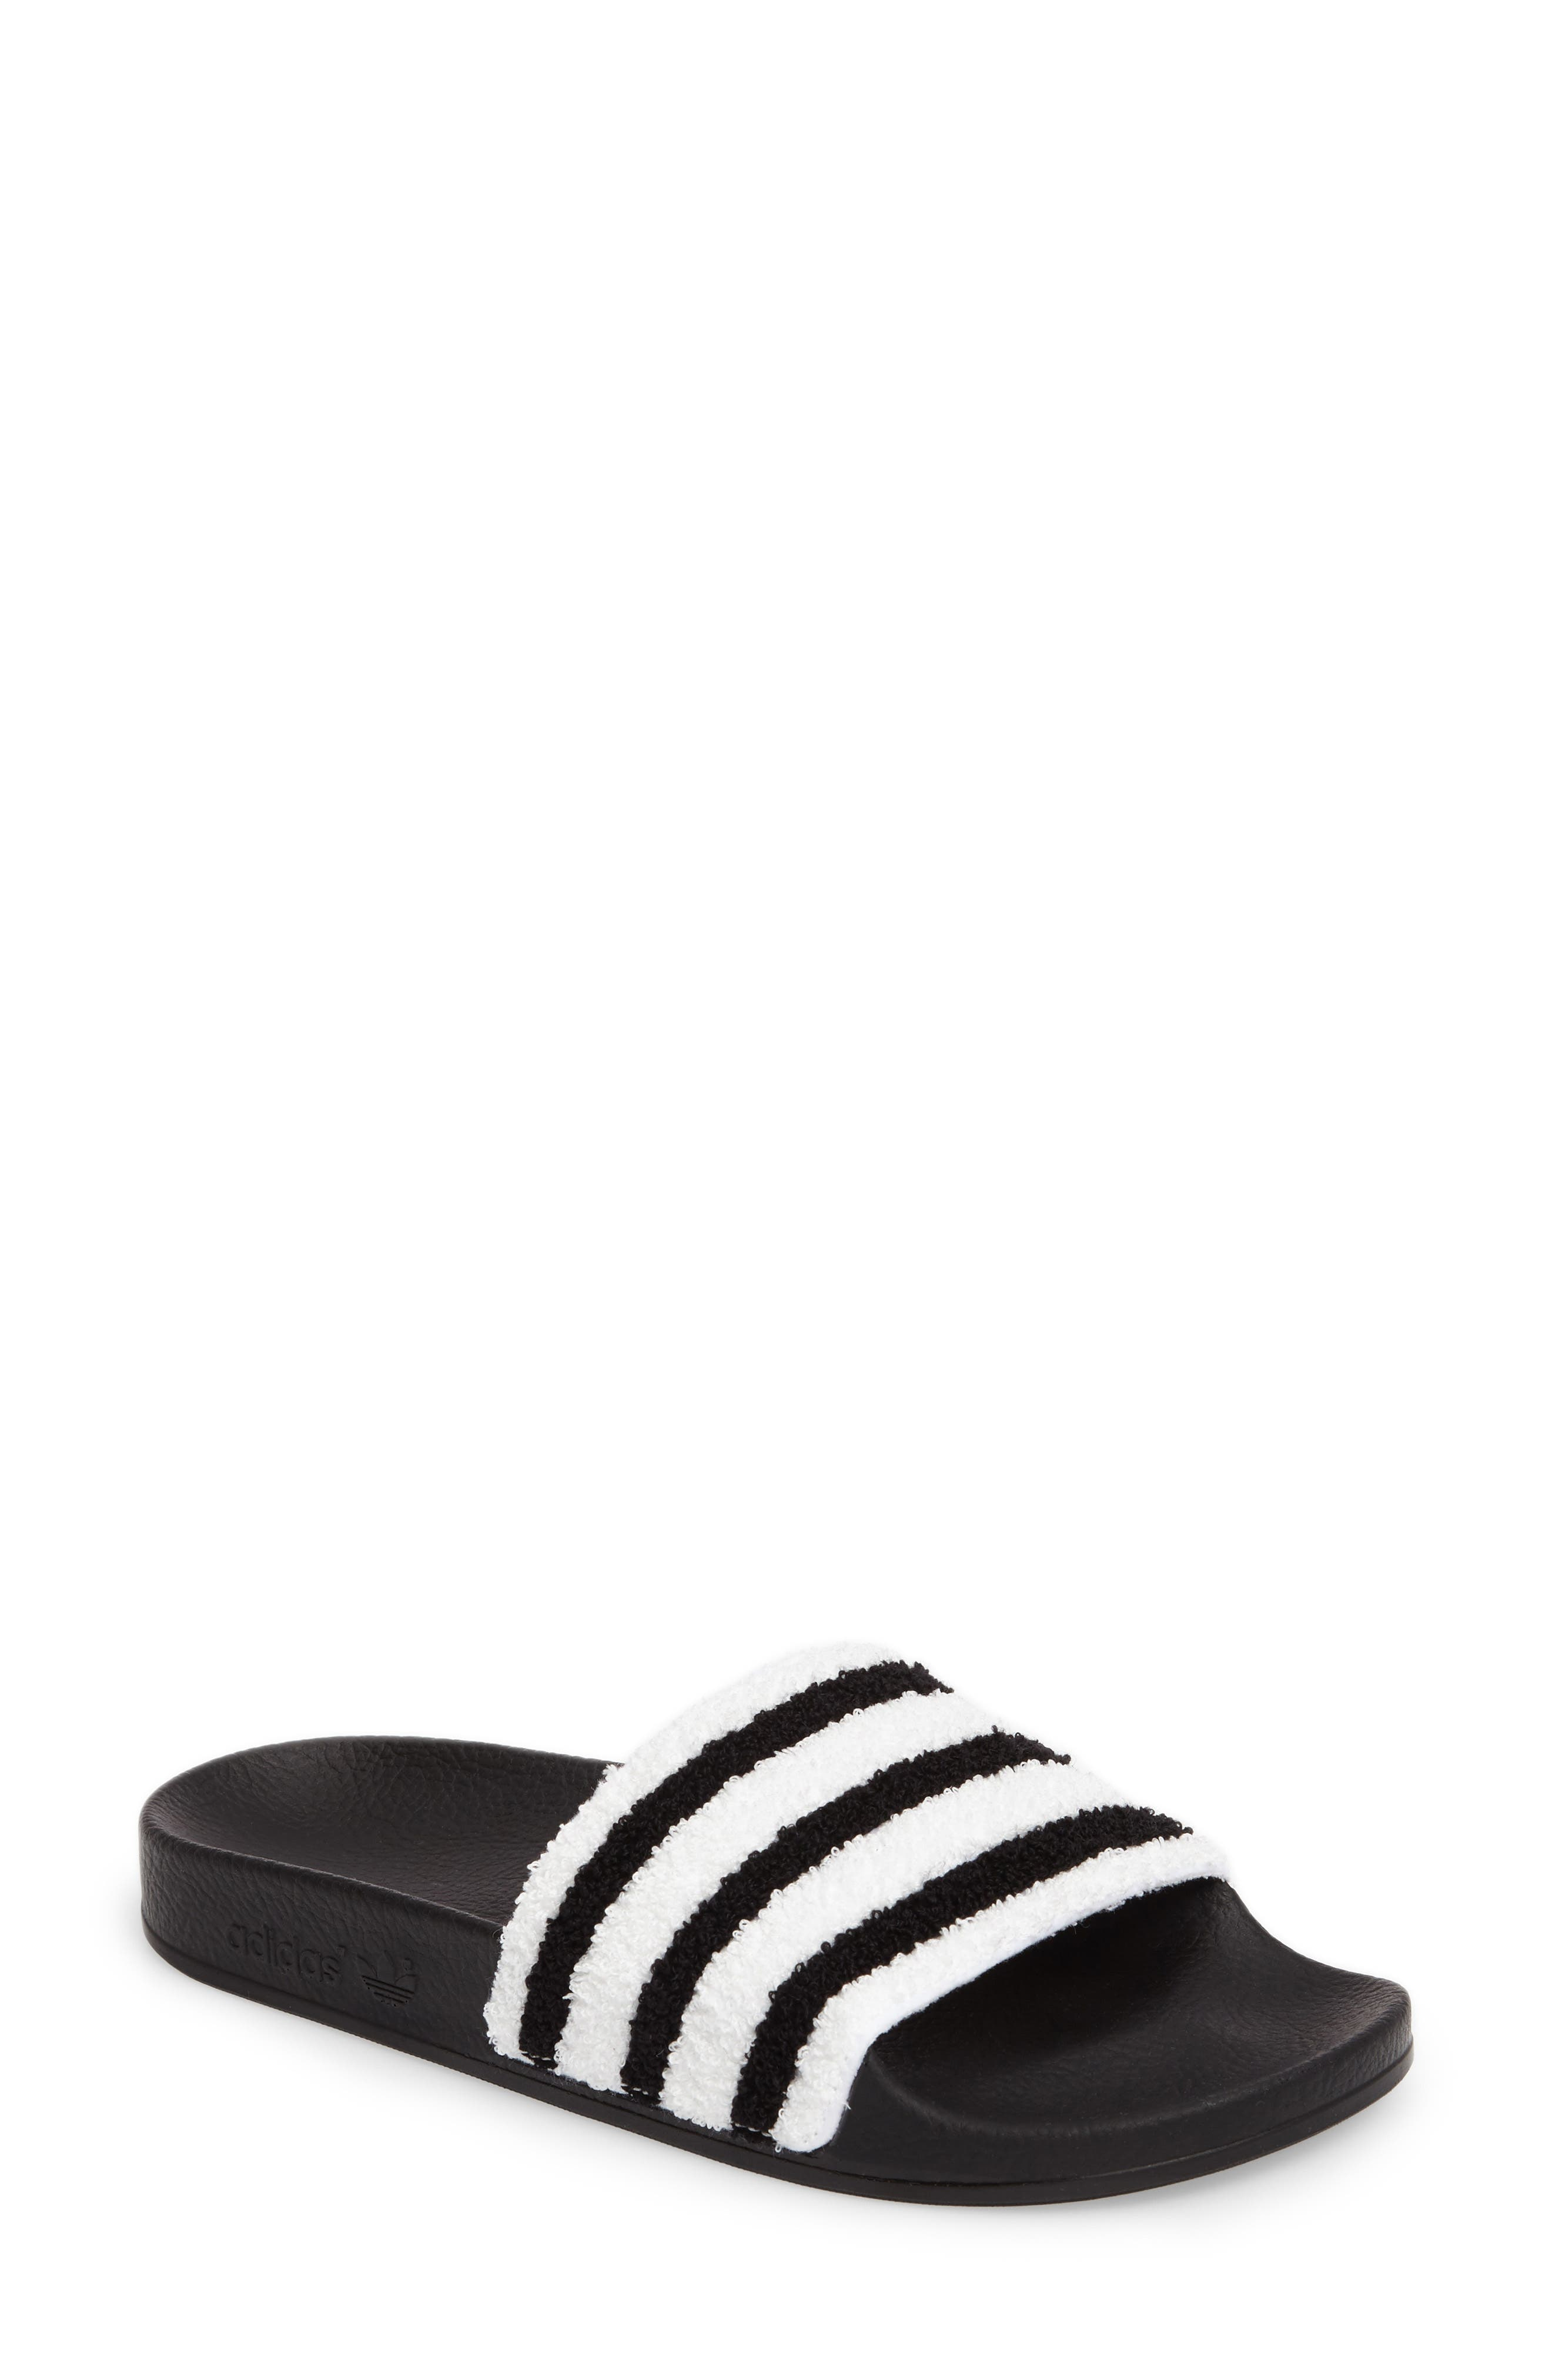 ba0a018b7ce3 sandals adidas cheap   OFF63% Discounted